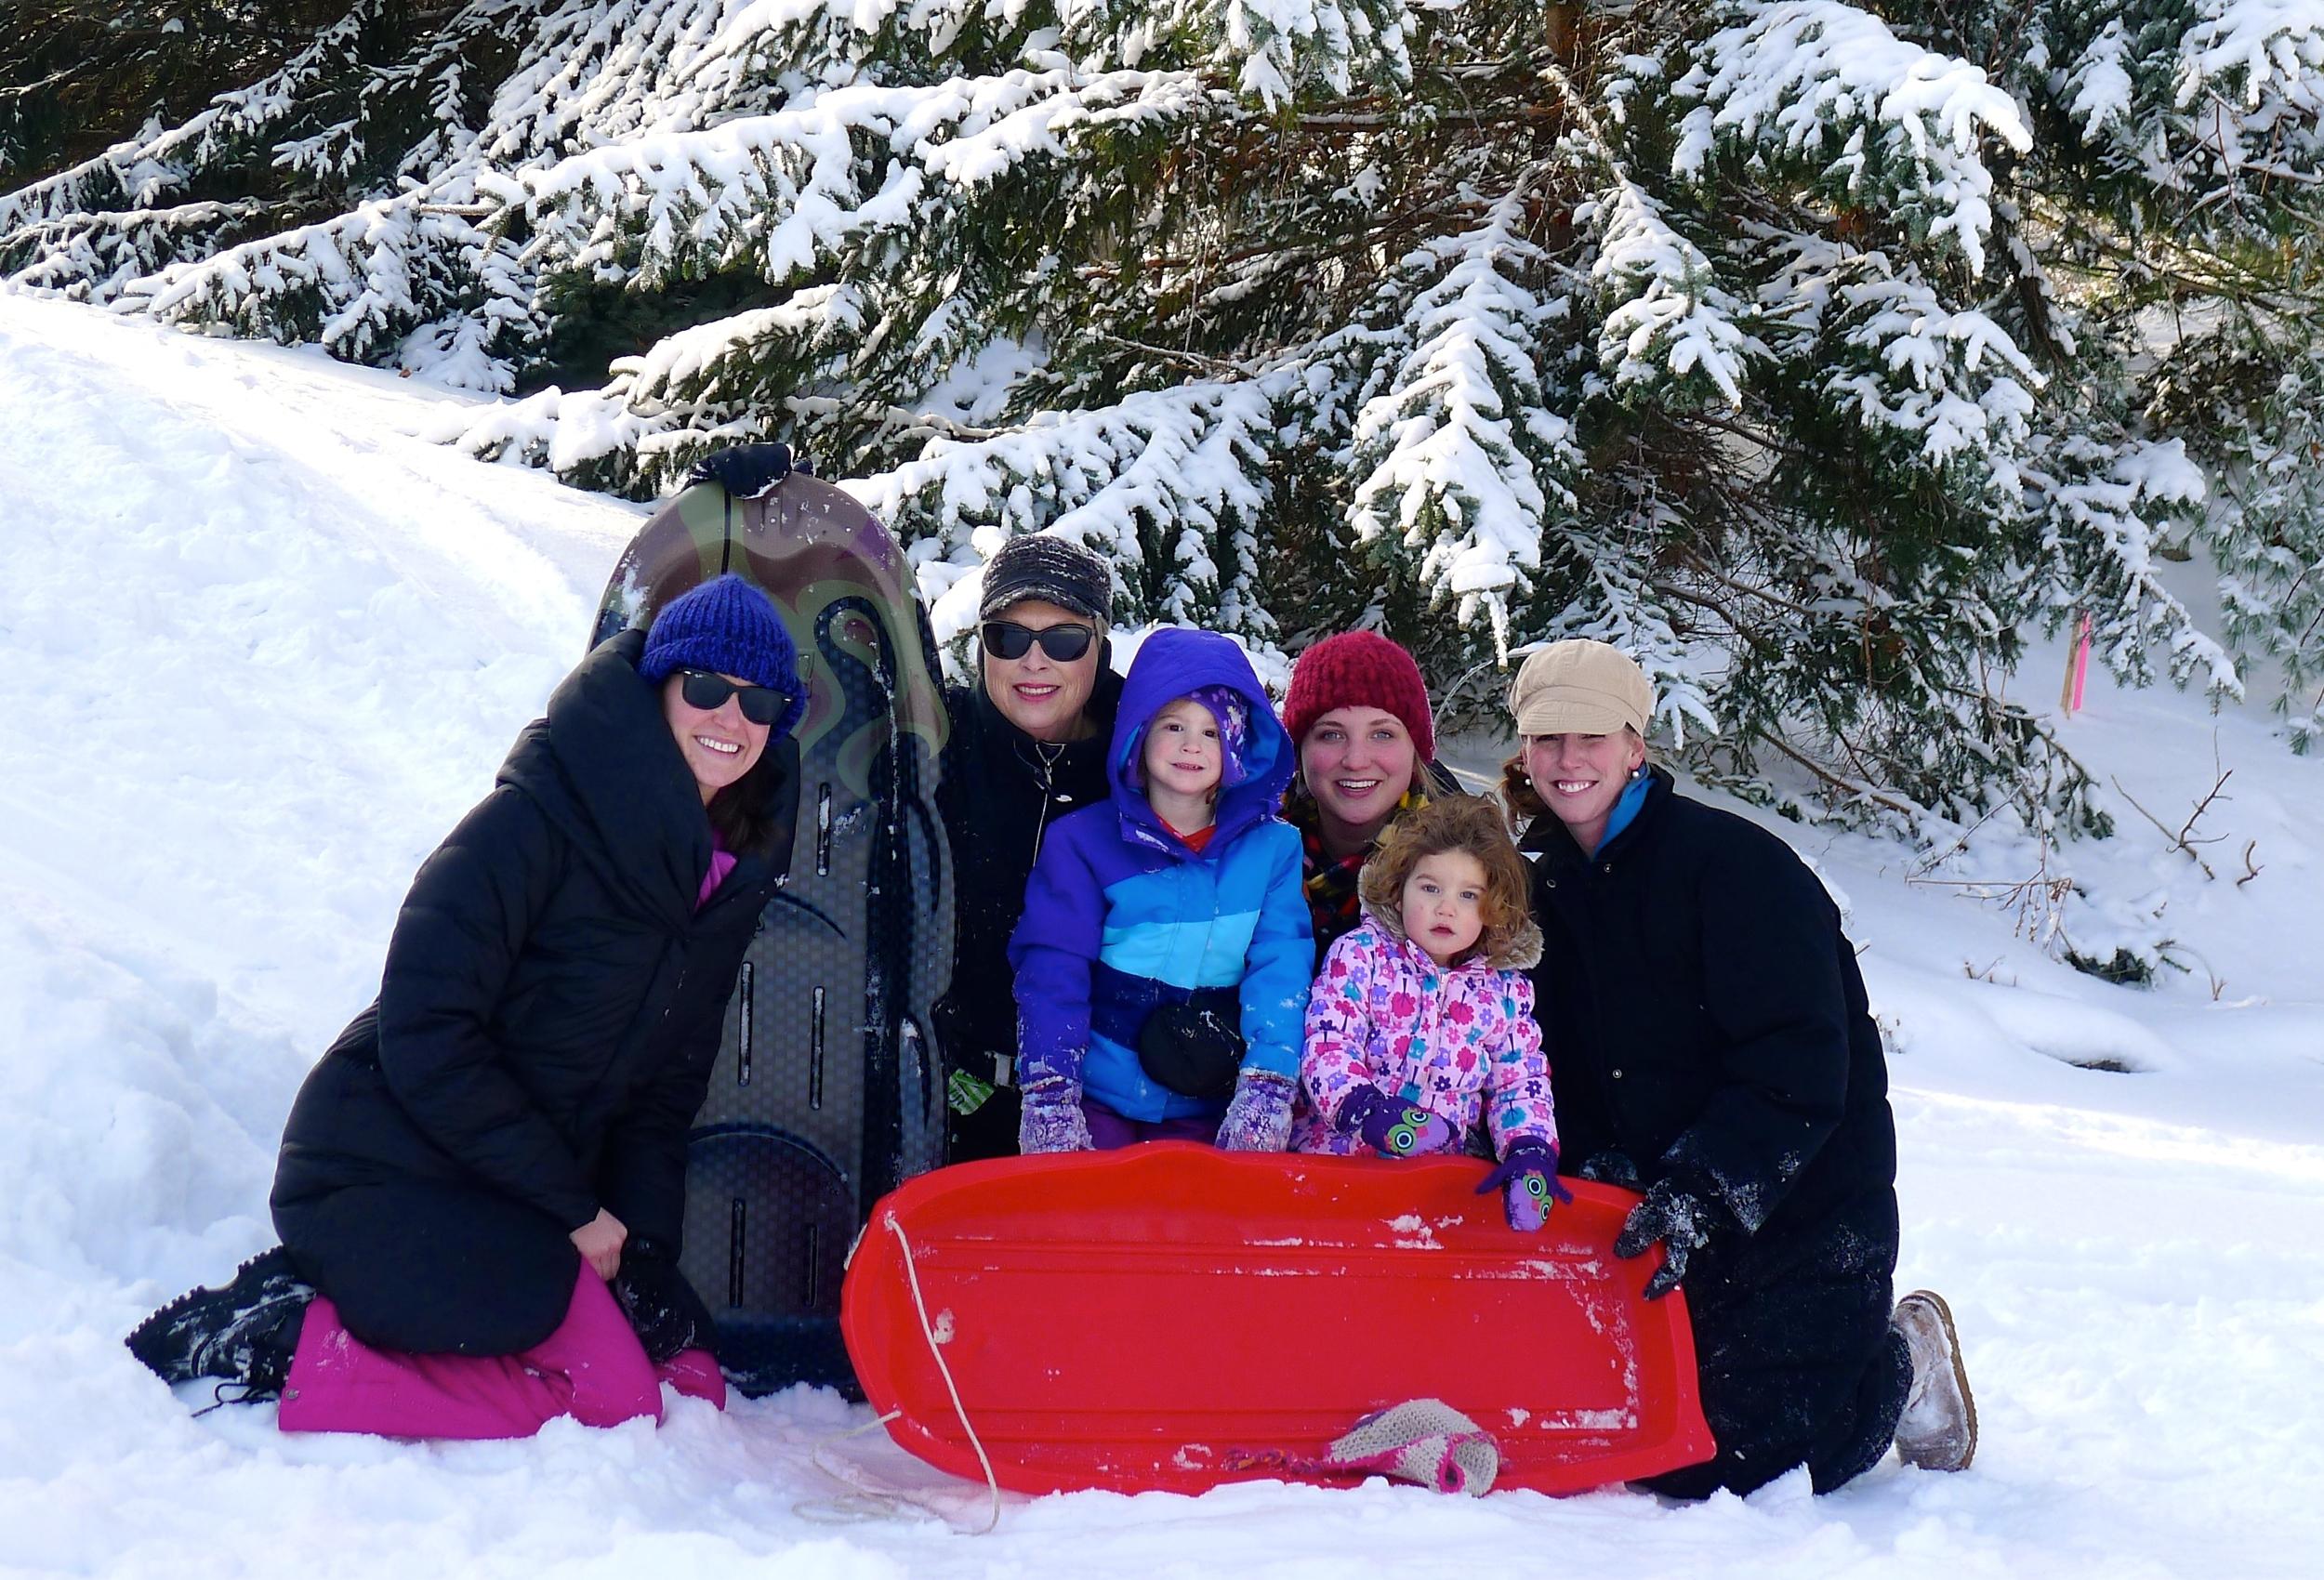 SNOW BUNNIES - ME, MARI, STEPH, JEN, EMMA, AND ZOE.